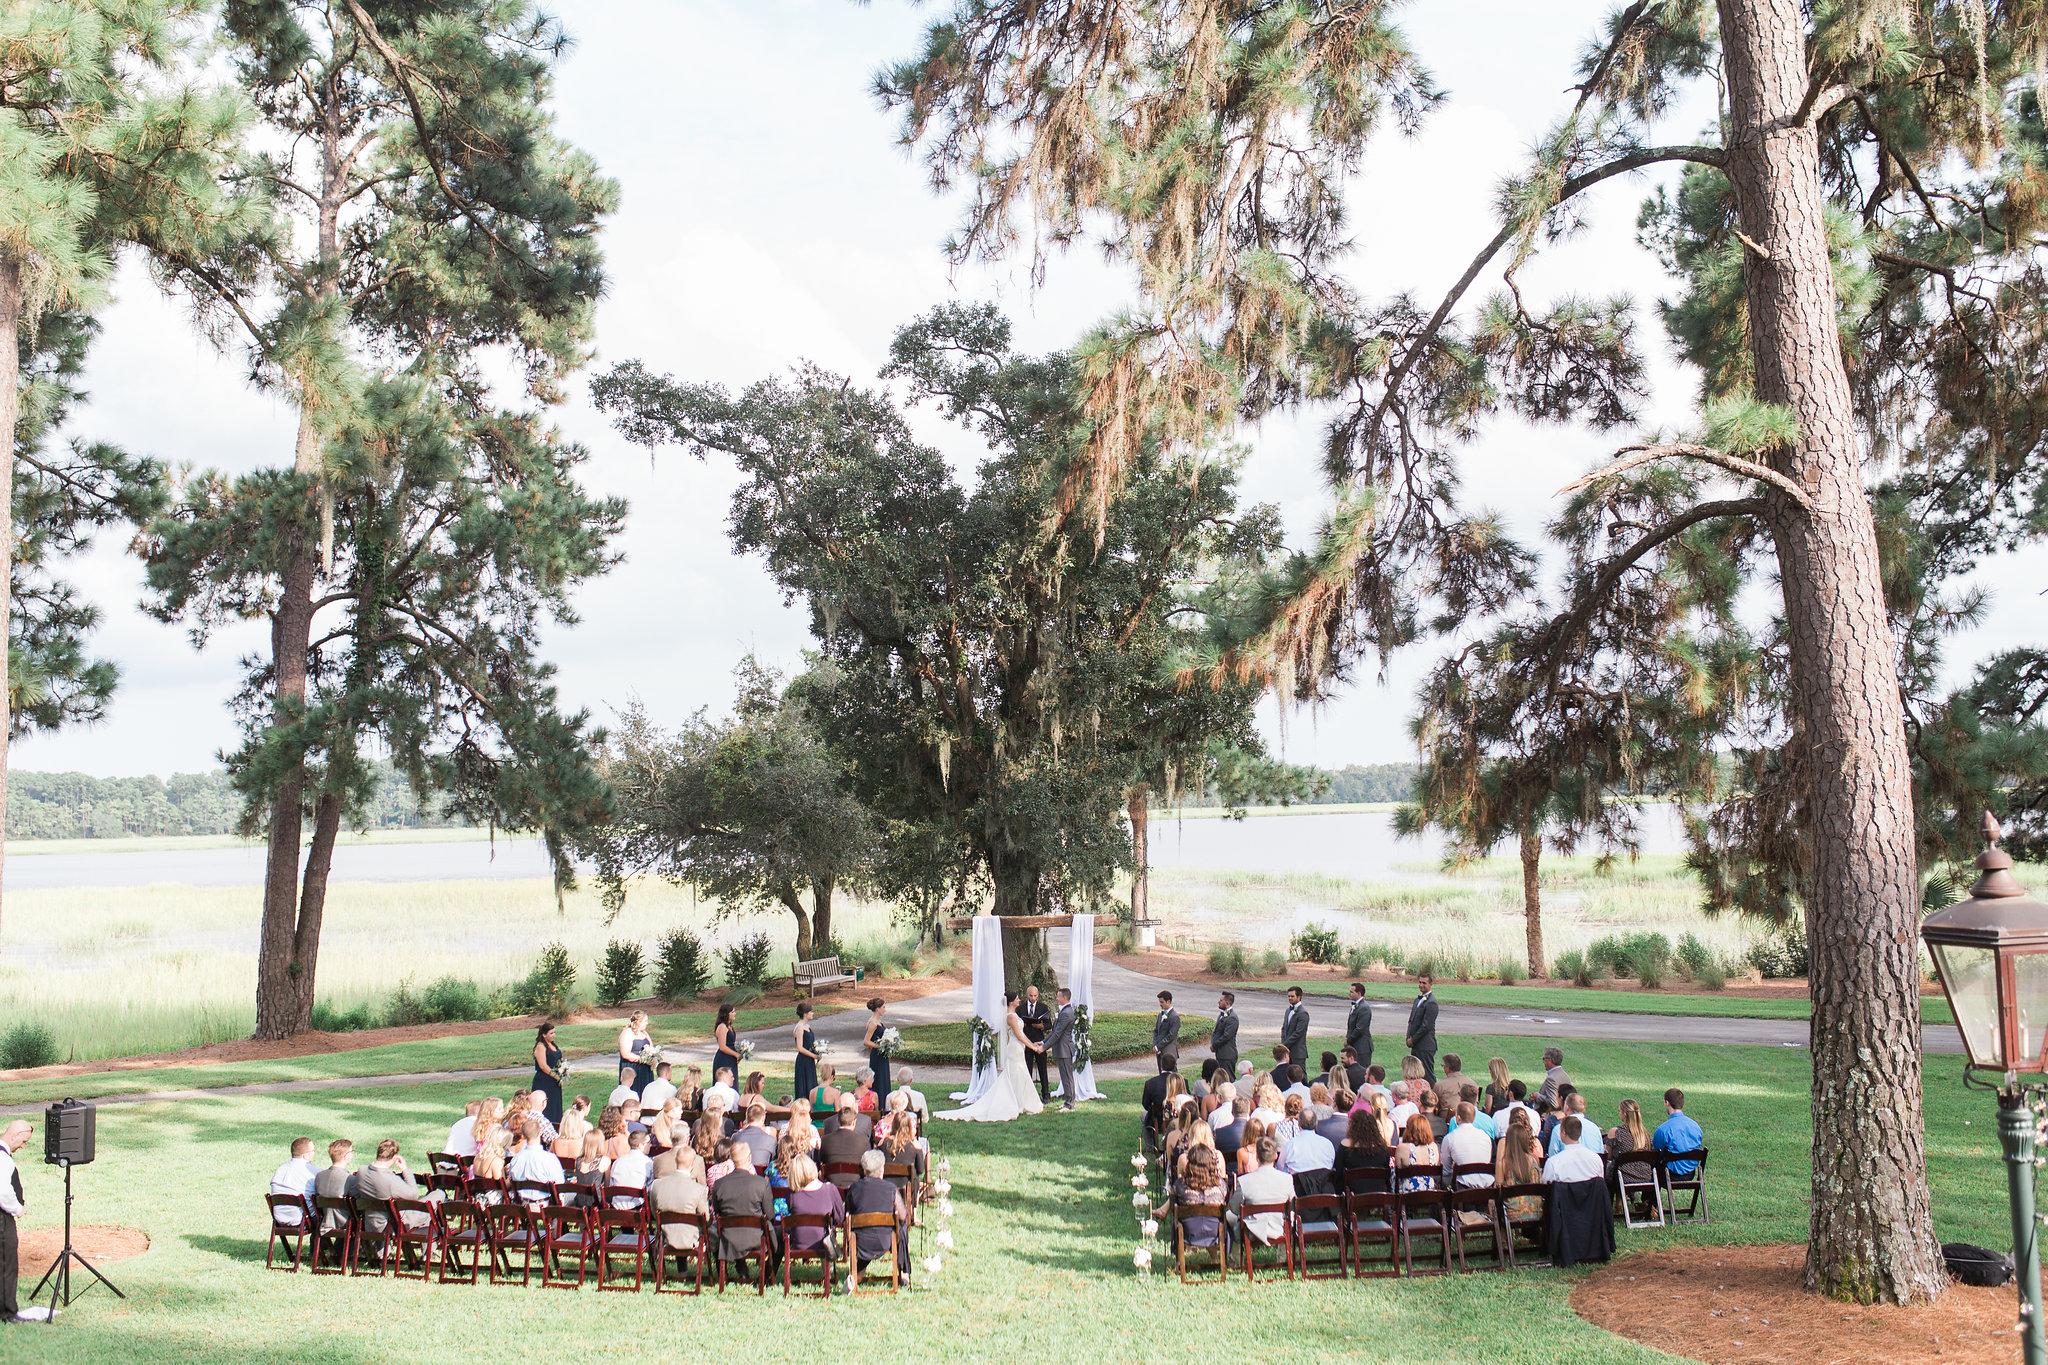 apt-b-photography-lauren-graham-oldfield-wedding-south-carolina-wedding-photographer-savannah-wedding-lowcountry-wedding-coastal-wedding-navy-wedding-plantation-wedding-26.JPG